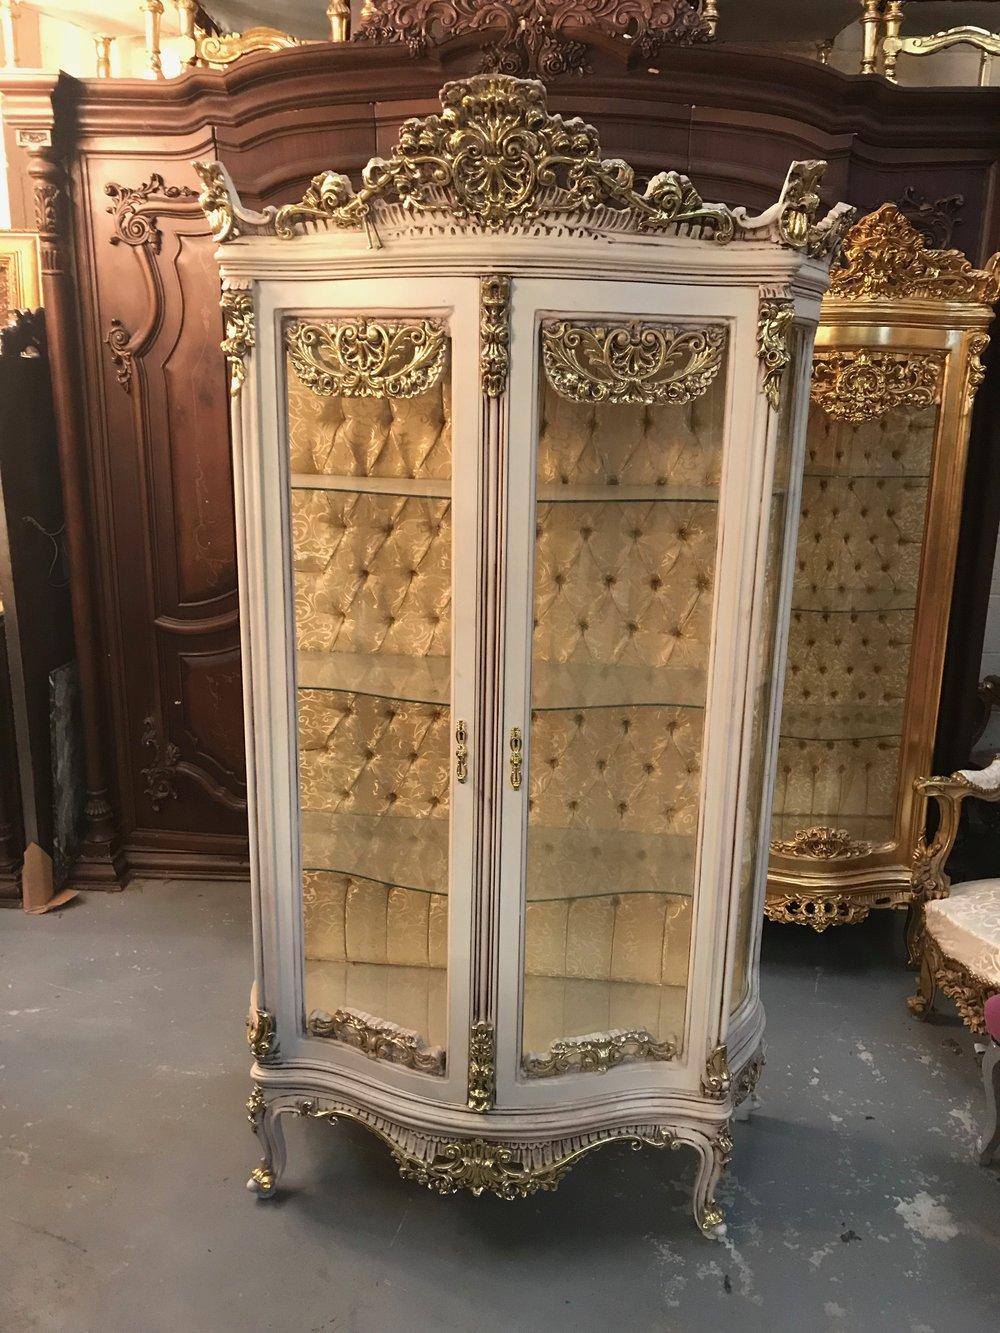 vitrine gilt glass cabinet Renaissance Antique Furniture and Lighting Warehouse Dublin Ireland